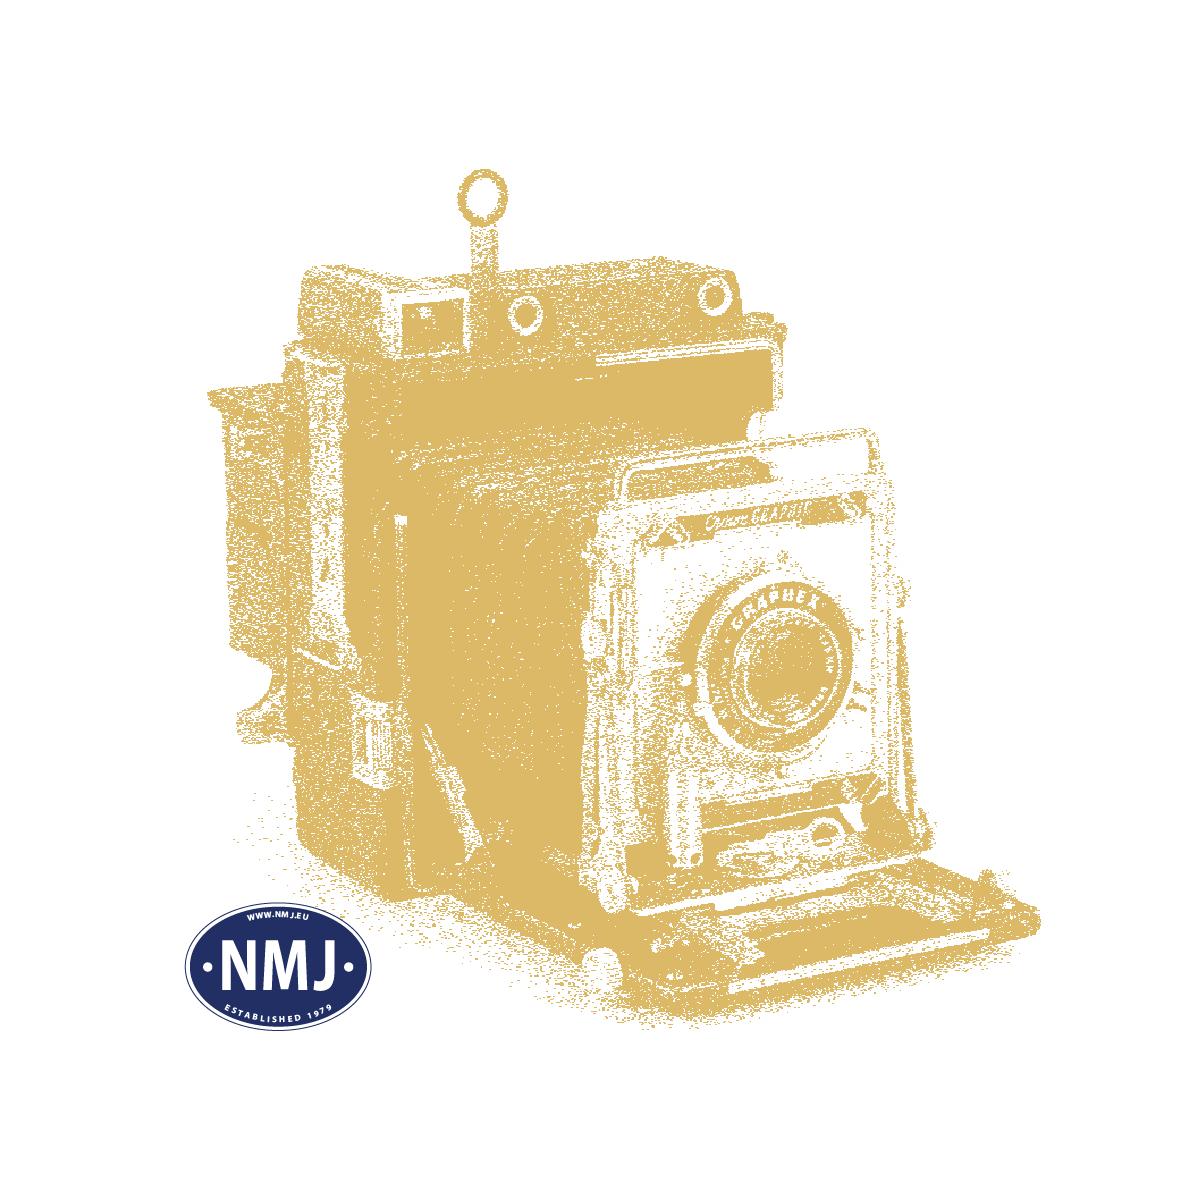 NMJT245001 - NMJ Topline NSB Di3b 641, Red/Brown Livery, 0-Scale, DCC w/ Sound